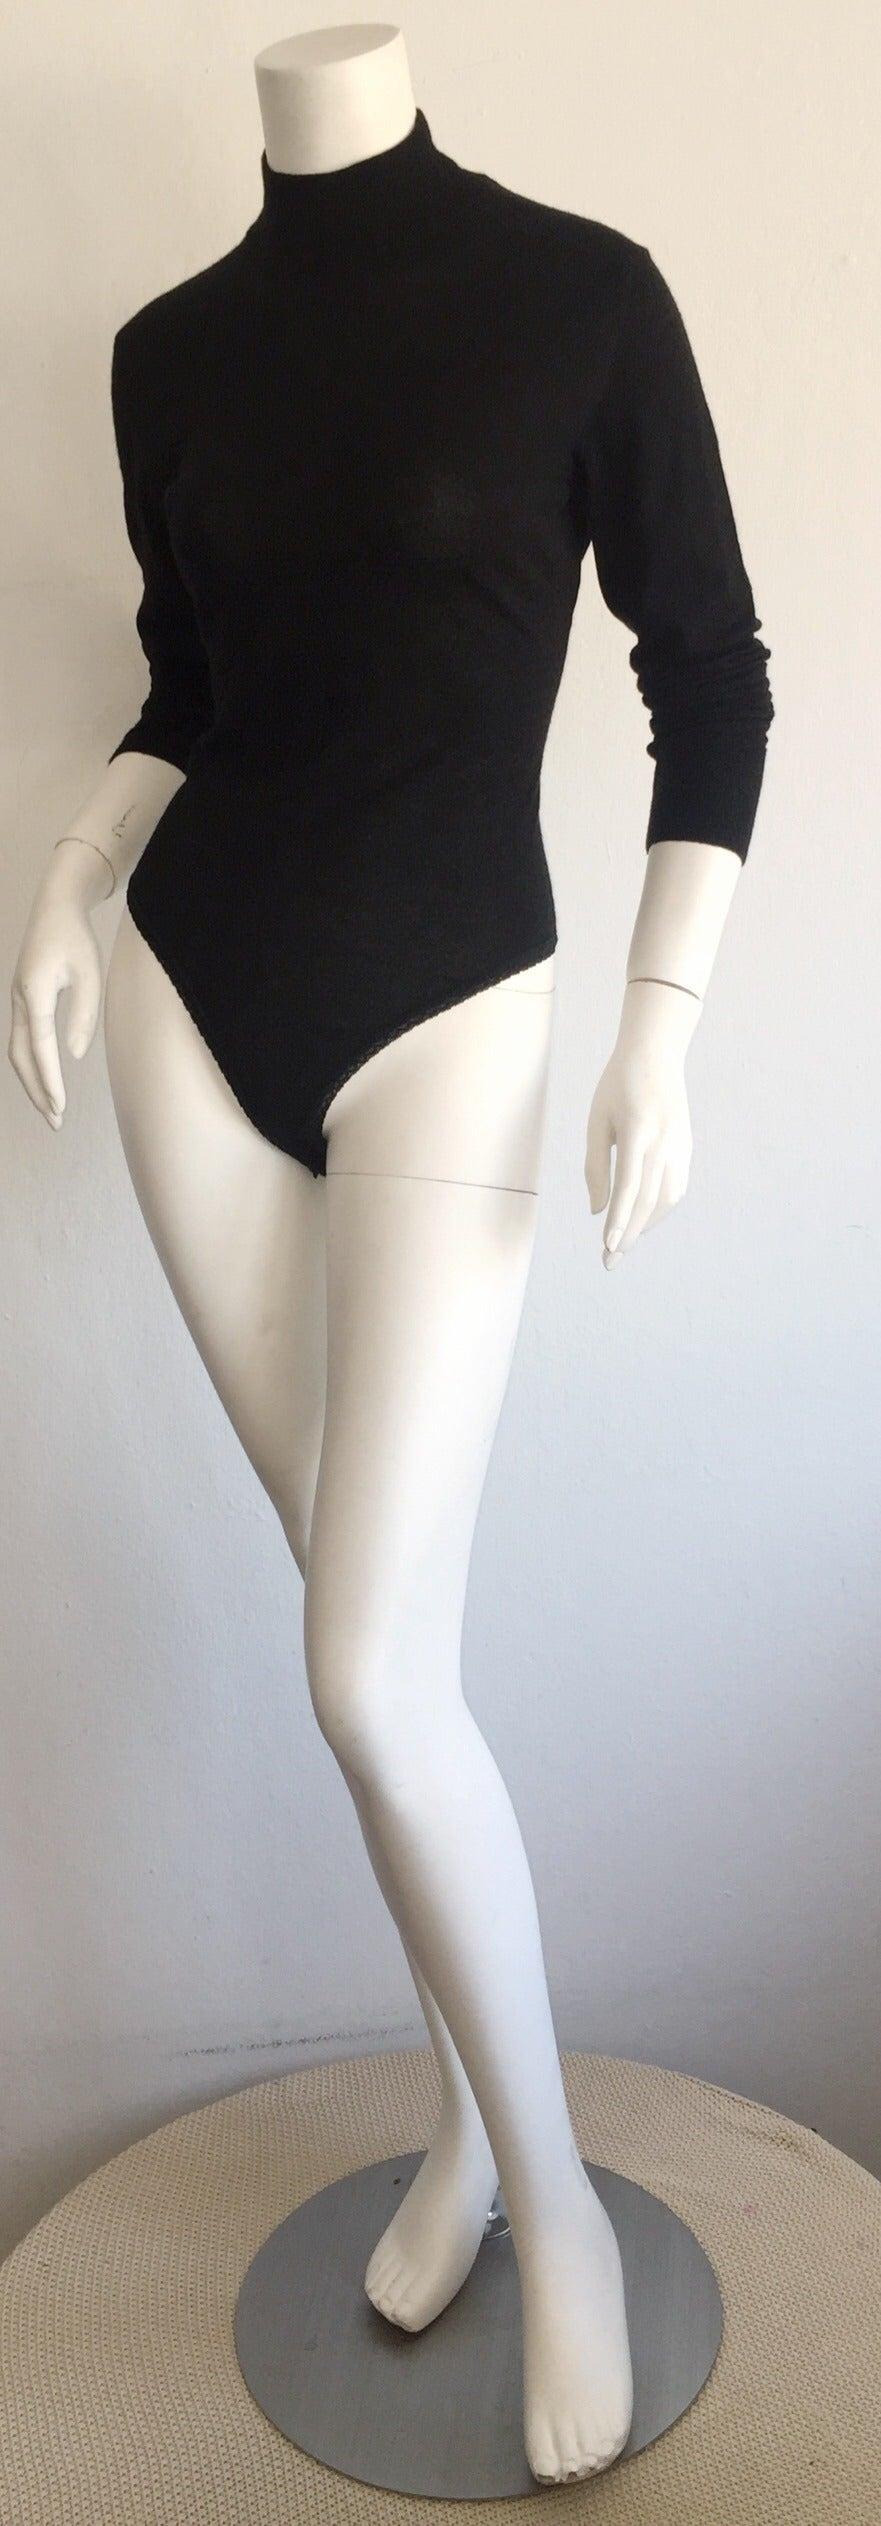 Sexy Vintage Donna Karan Black Cashmere Bodysuit / Onesie In Excellent Condition For Sale In San Francisco, CA